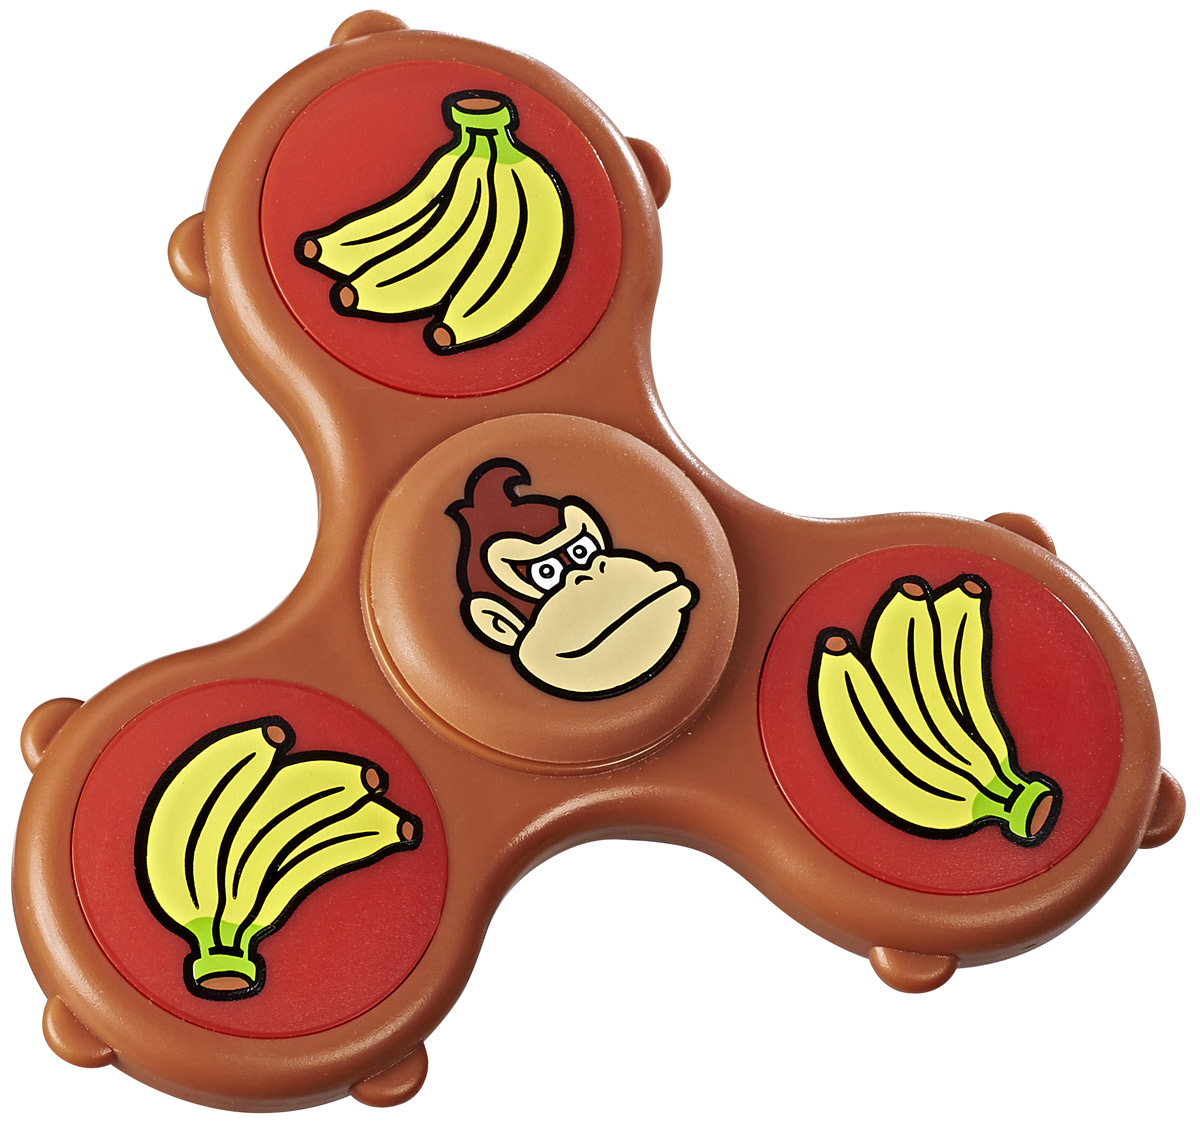 Fidget Its Спиннер Donkey Kong fidget its антистрессовая игрушка кубик transformers bumblebee